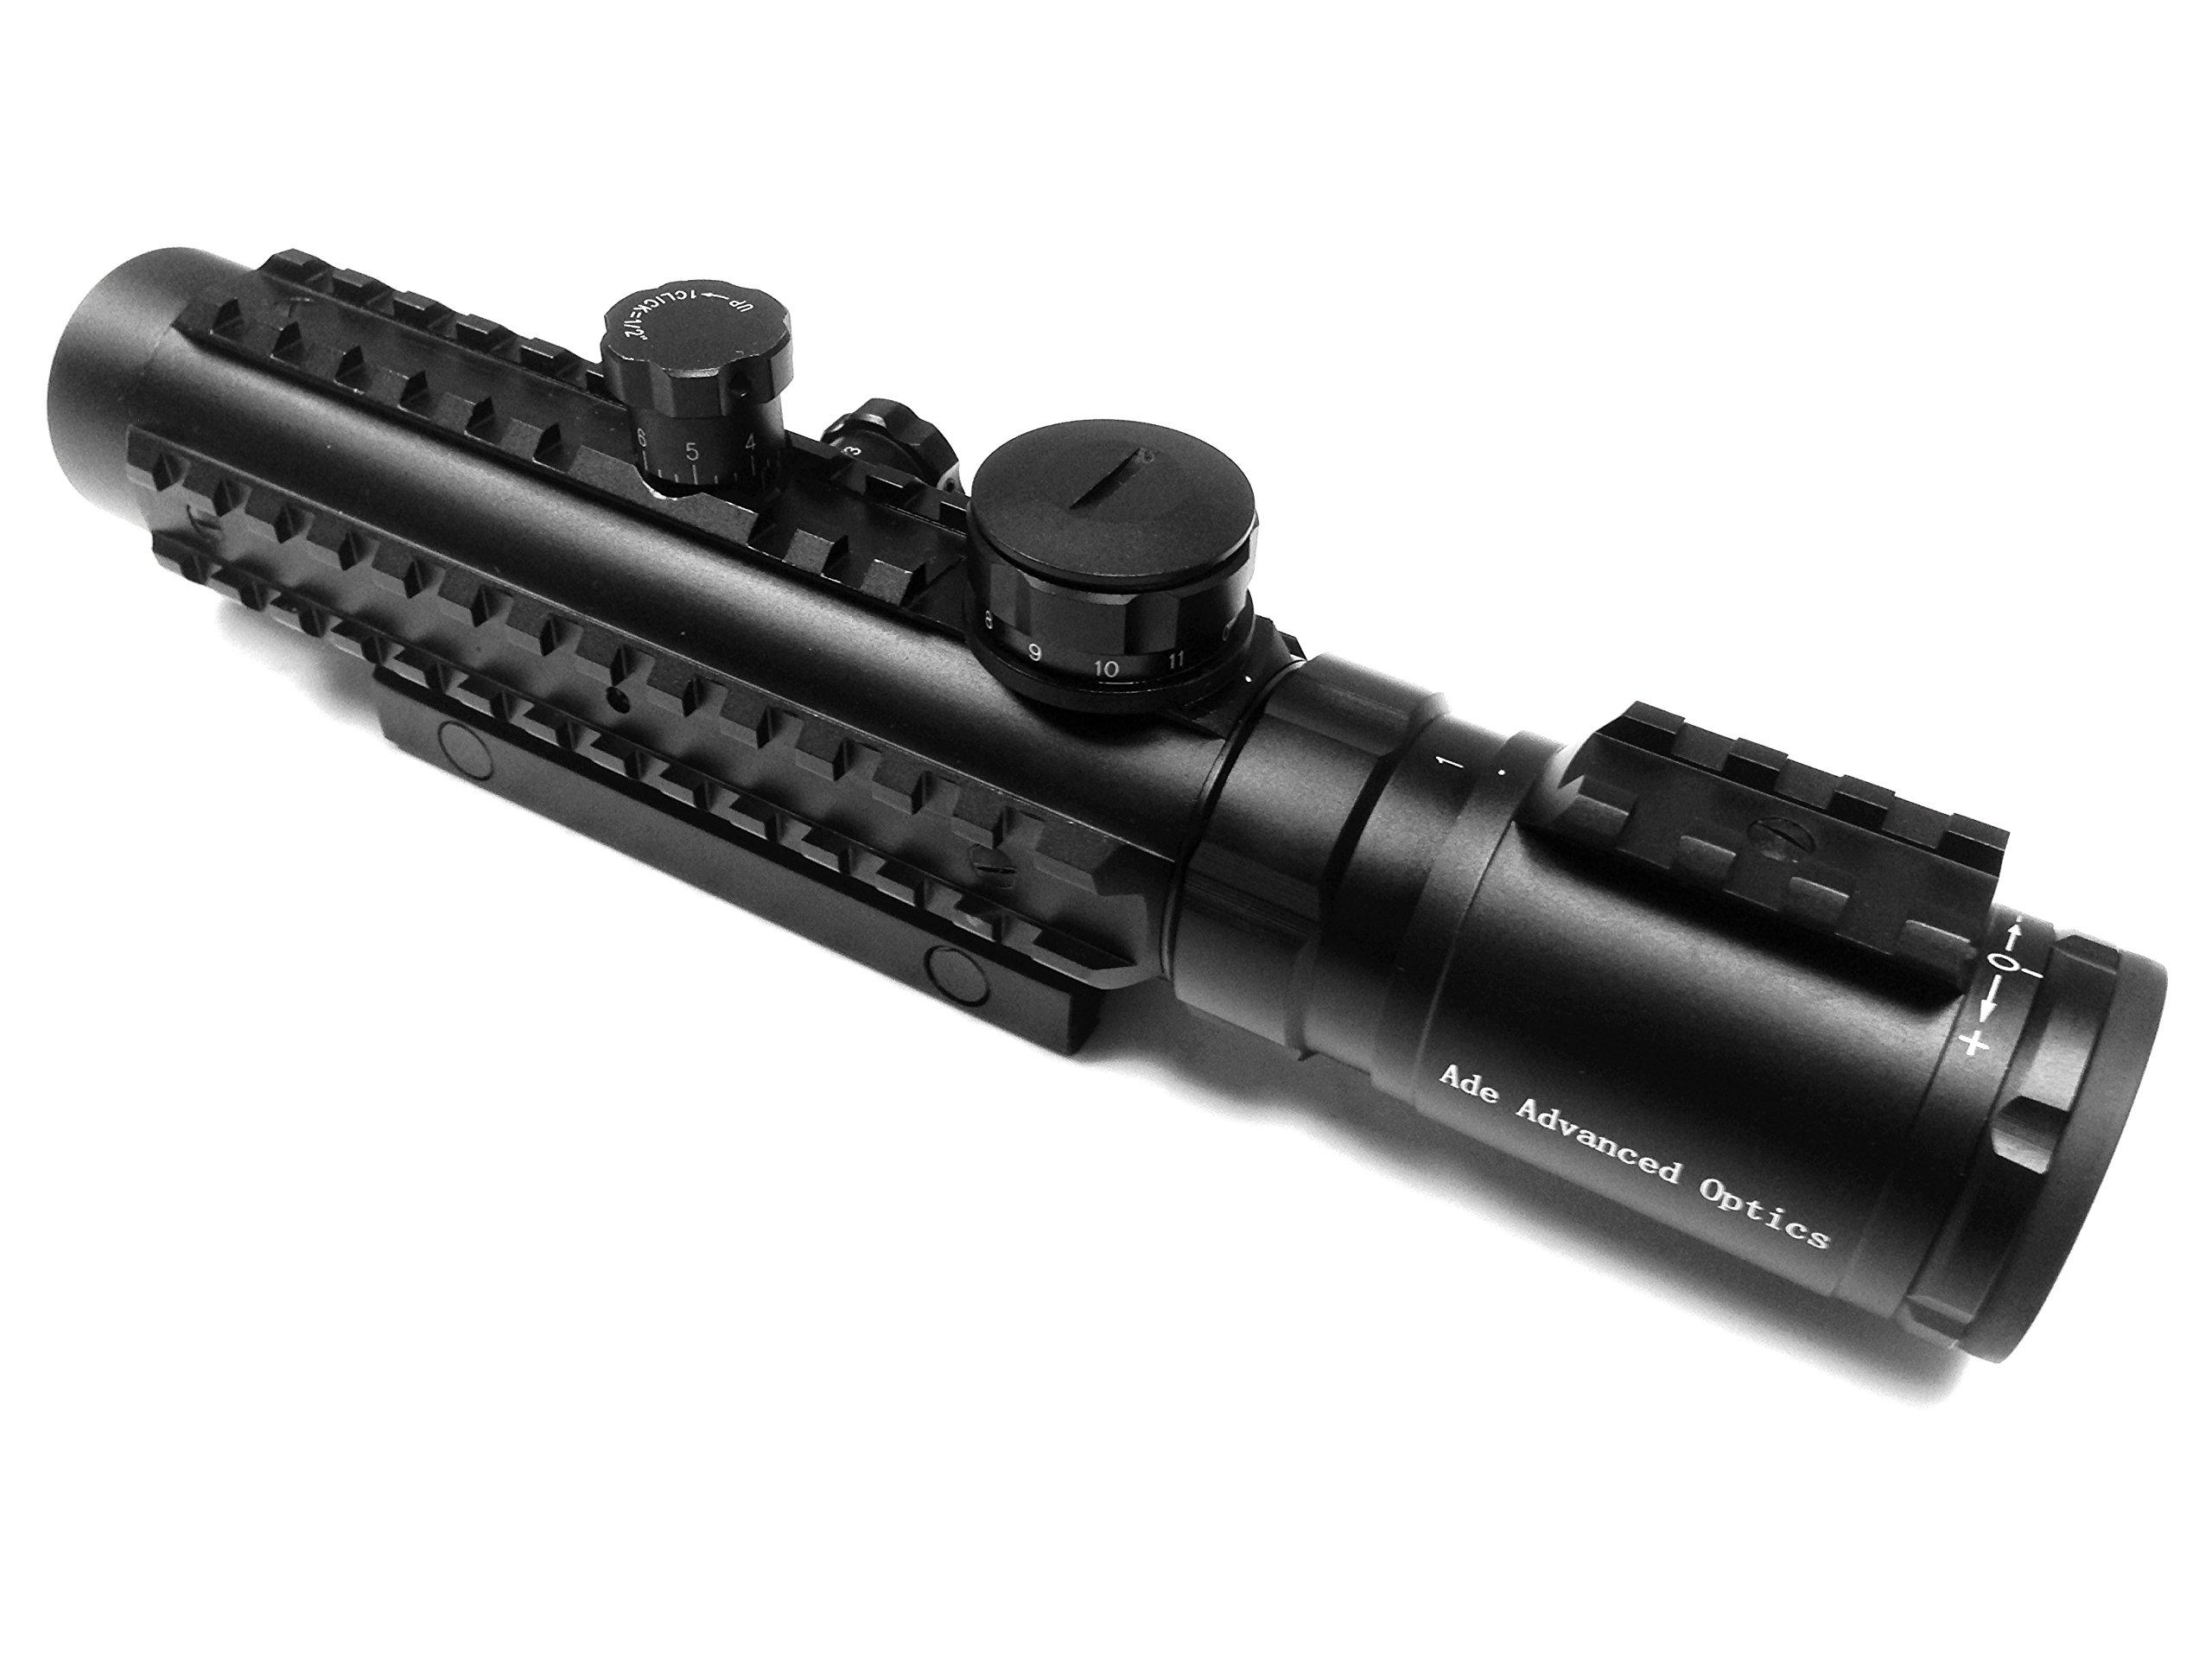 Ade Advanced Optics BE1-3X30IR Premium Illuminated Red Cross Electro Sight Riflescope, 1-3x 30mm